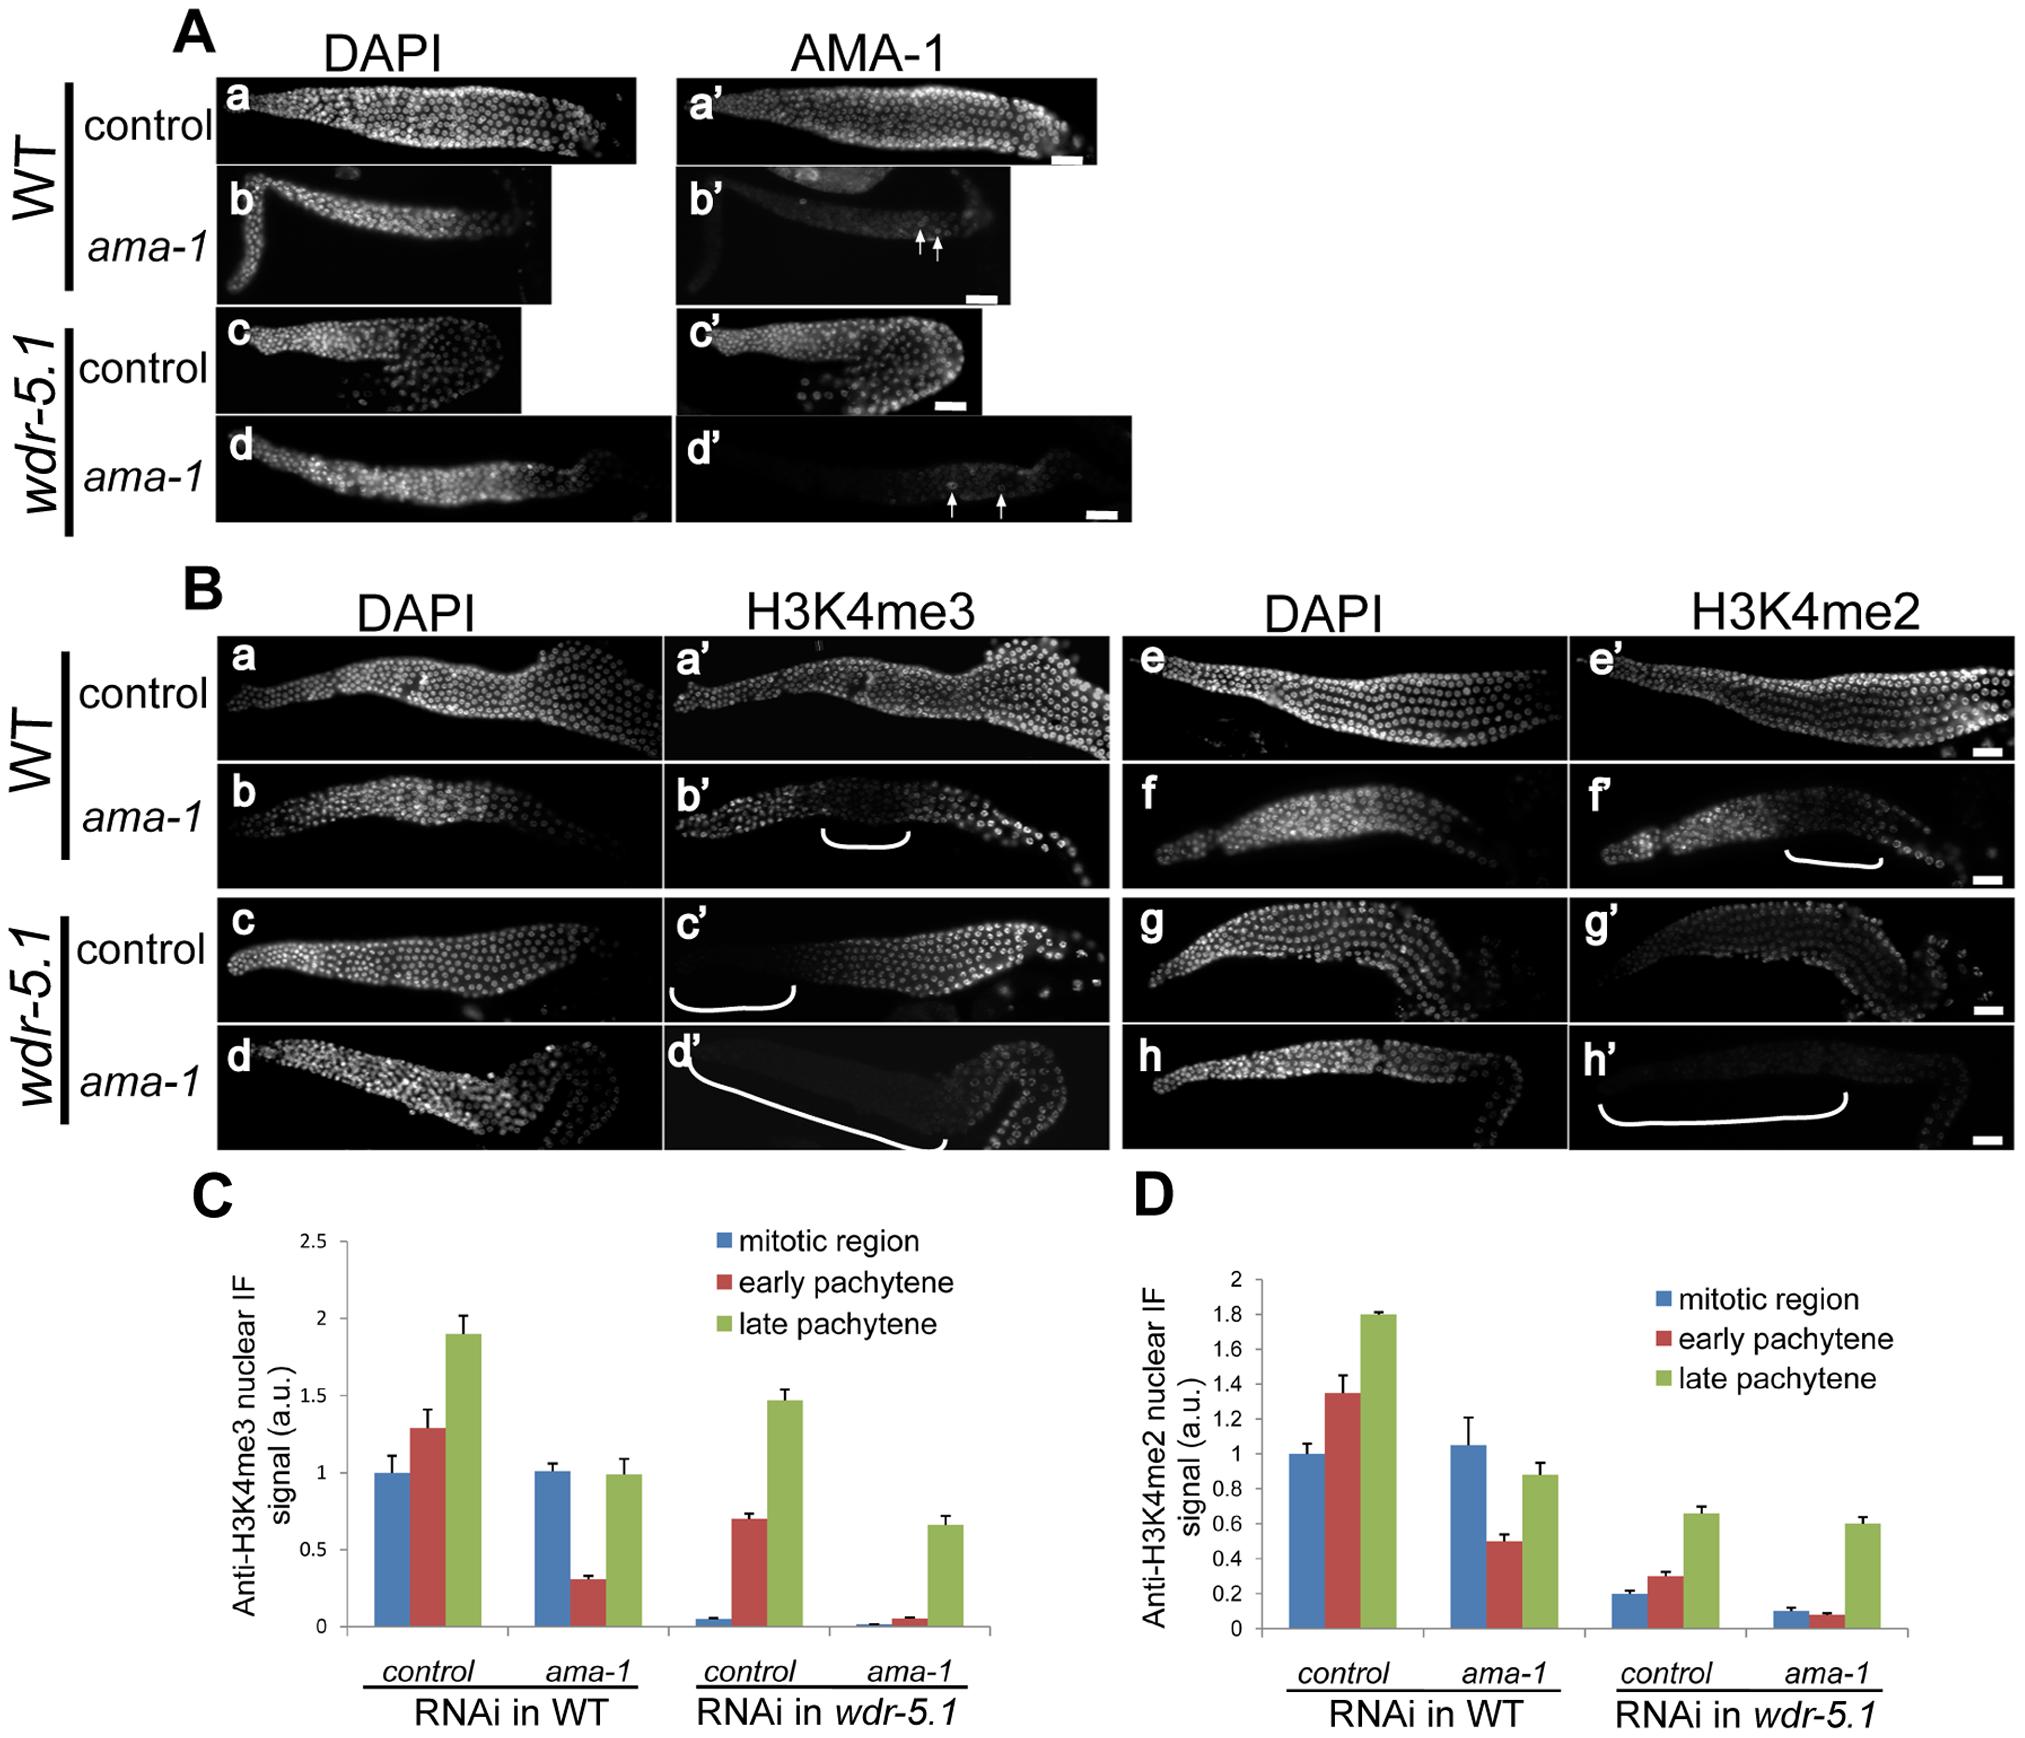 WDR-5.1–dependent H3K4 methylation in adult GSCs is unaffected by depletion of <i>ama-1</i>.